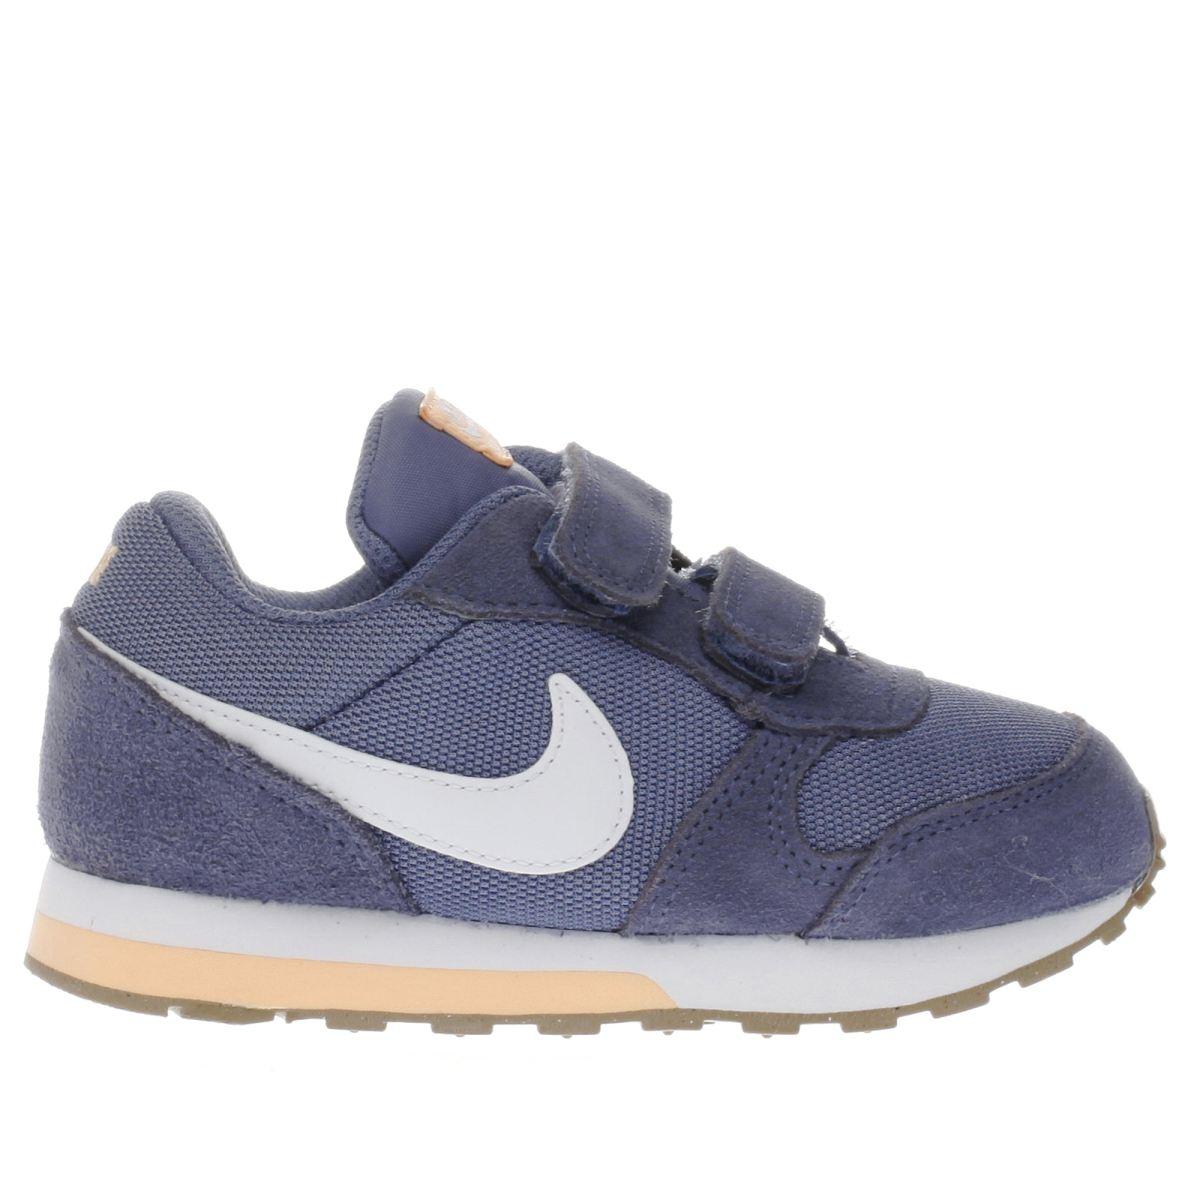 promo code 94acf e6c8b Youth Nike Free Run